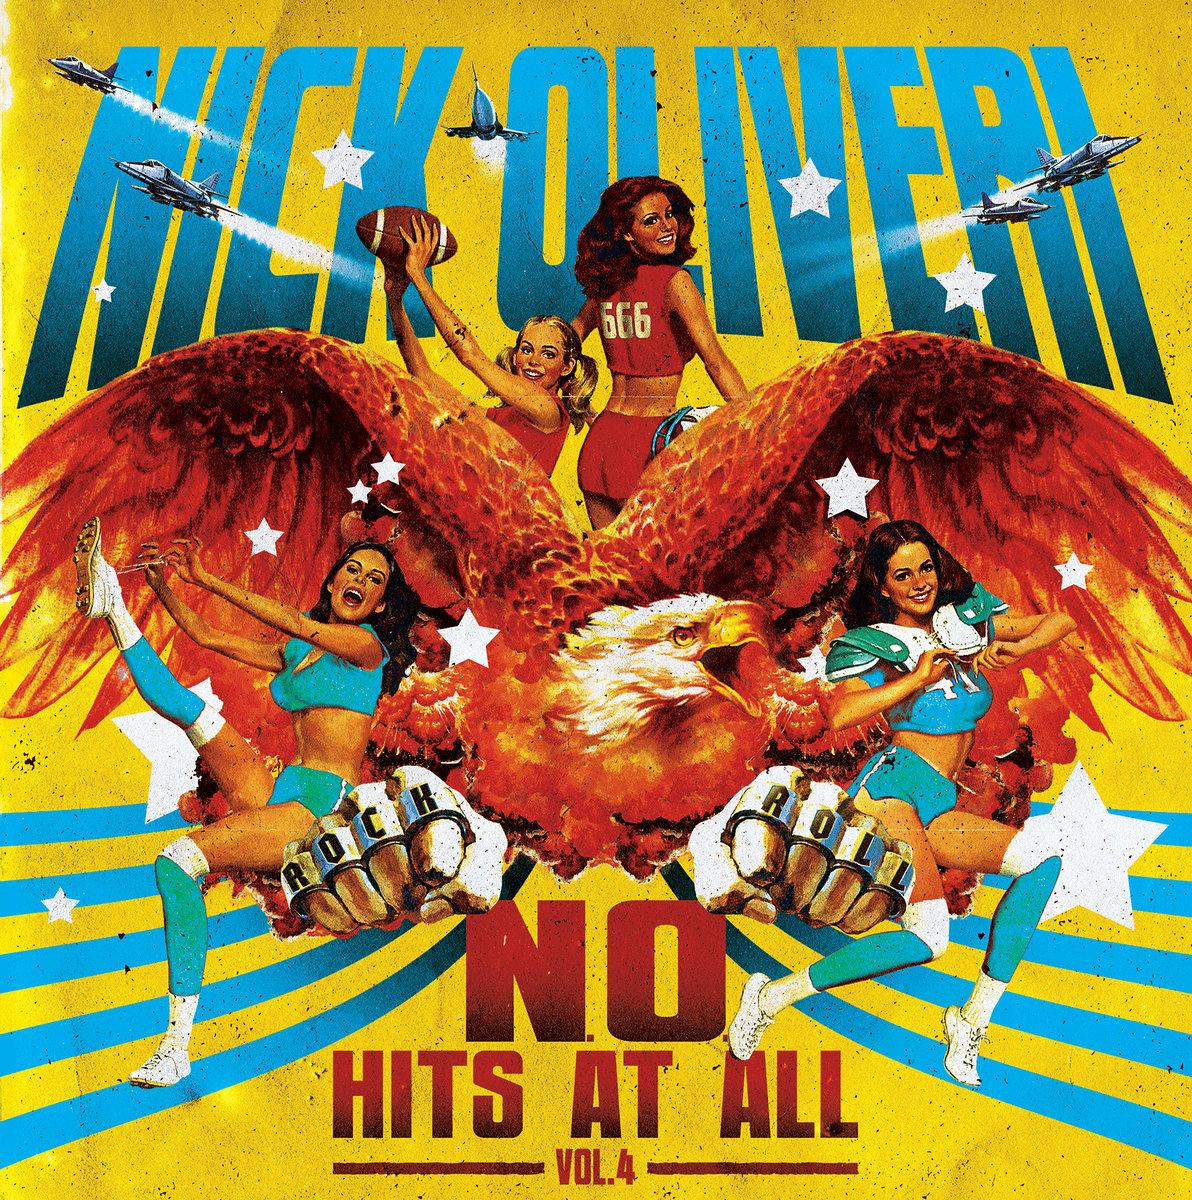 Nick Oliveri - N.O. Hits At All Vol. 4 [LTD LP] (Blue Vinyl)